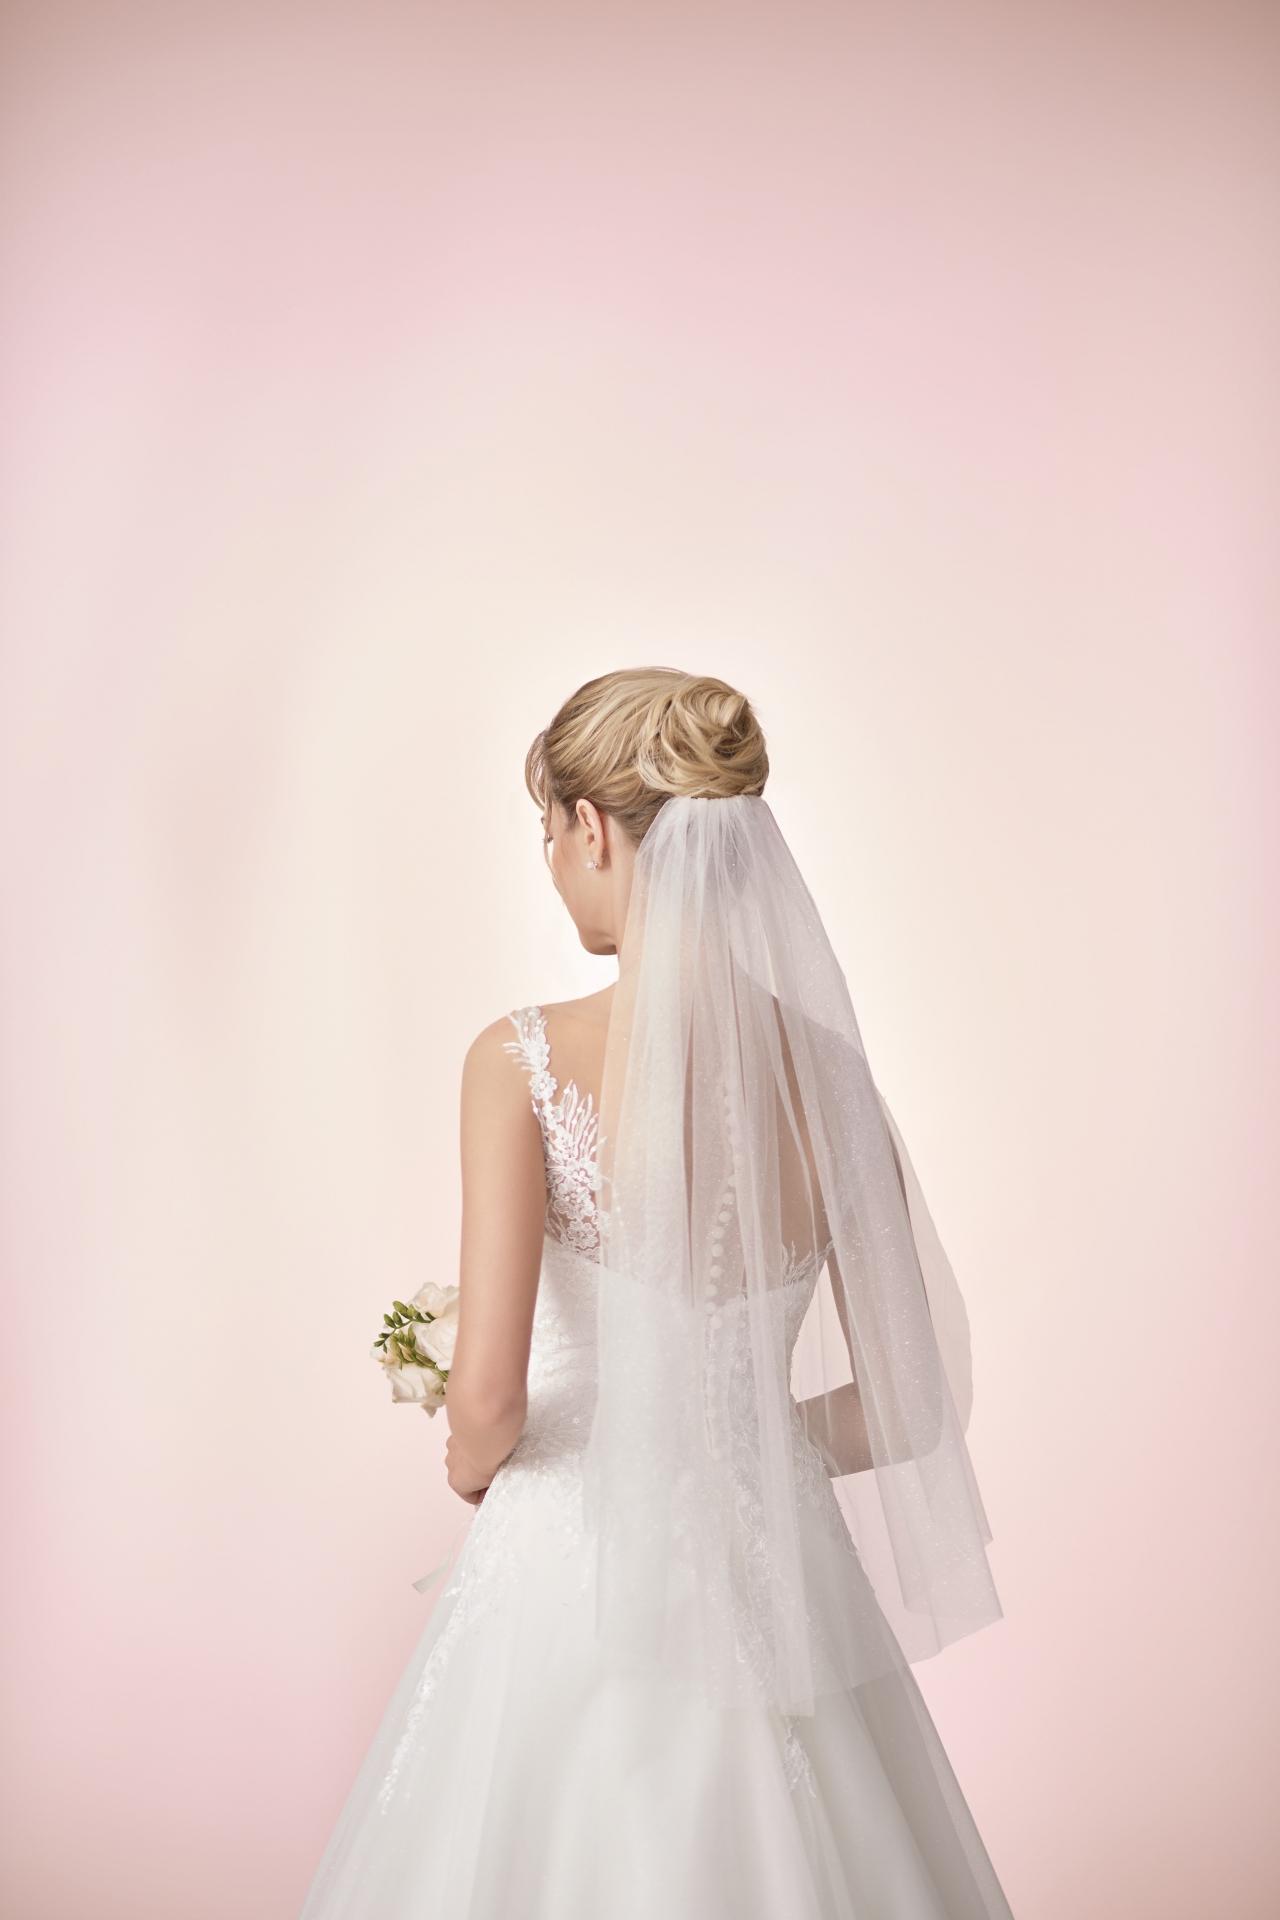 Brautkleid Elizabeth Konin 2019 - 4120T-2